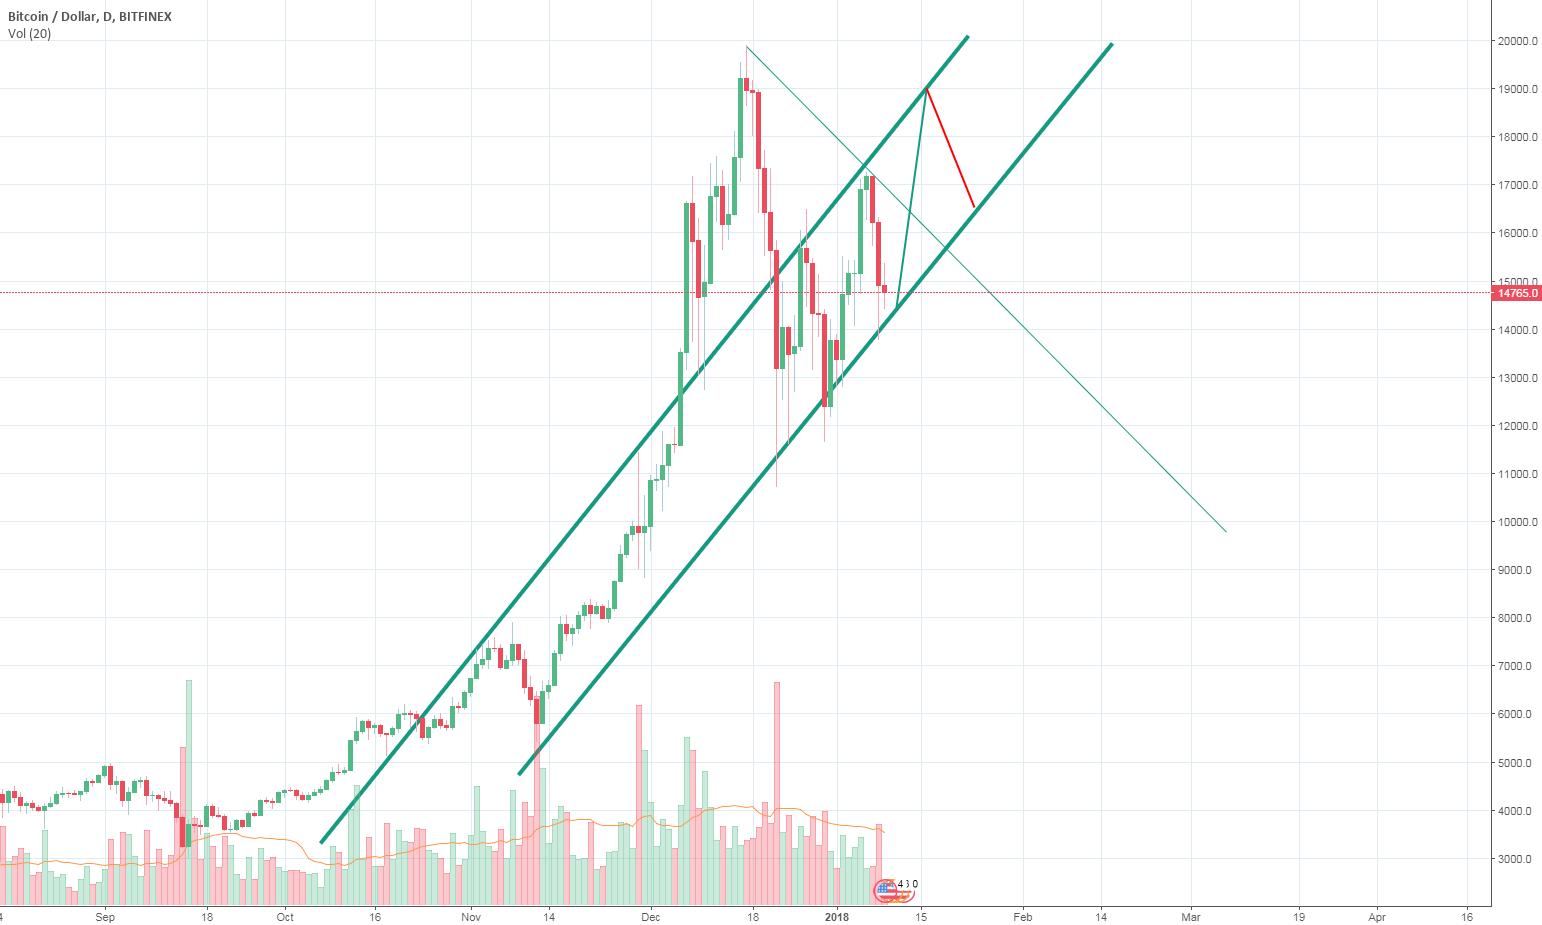 BTC Price Ascending Channel